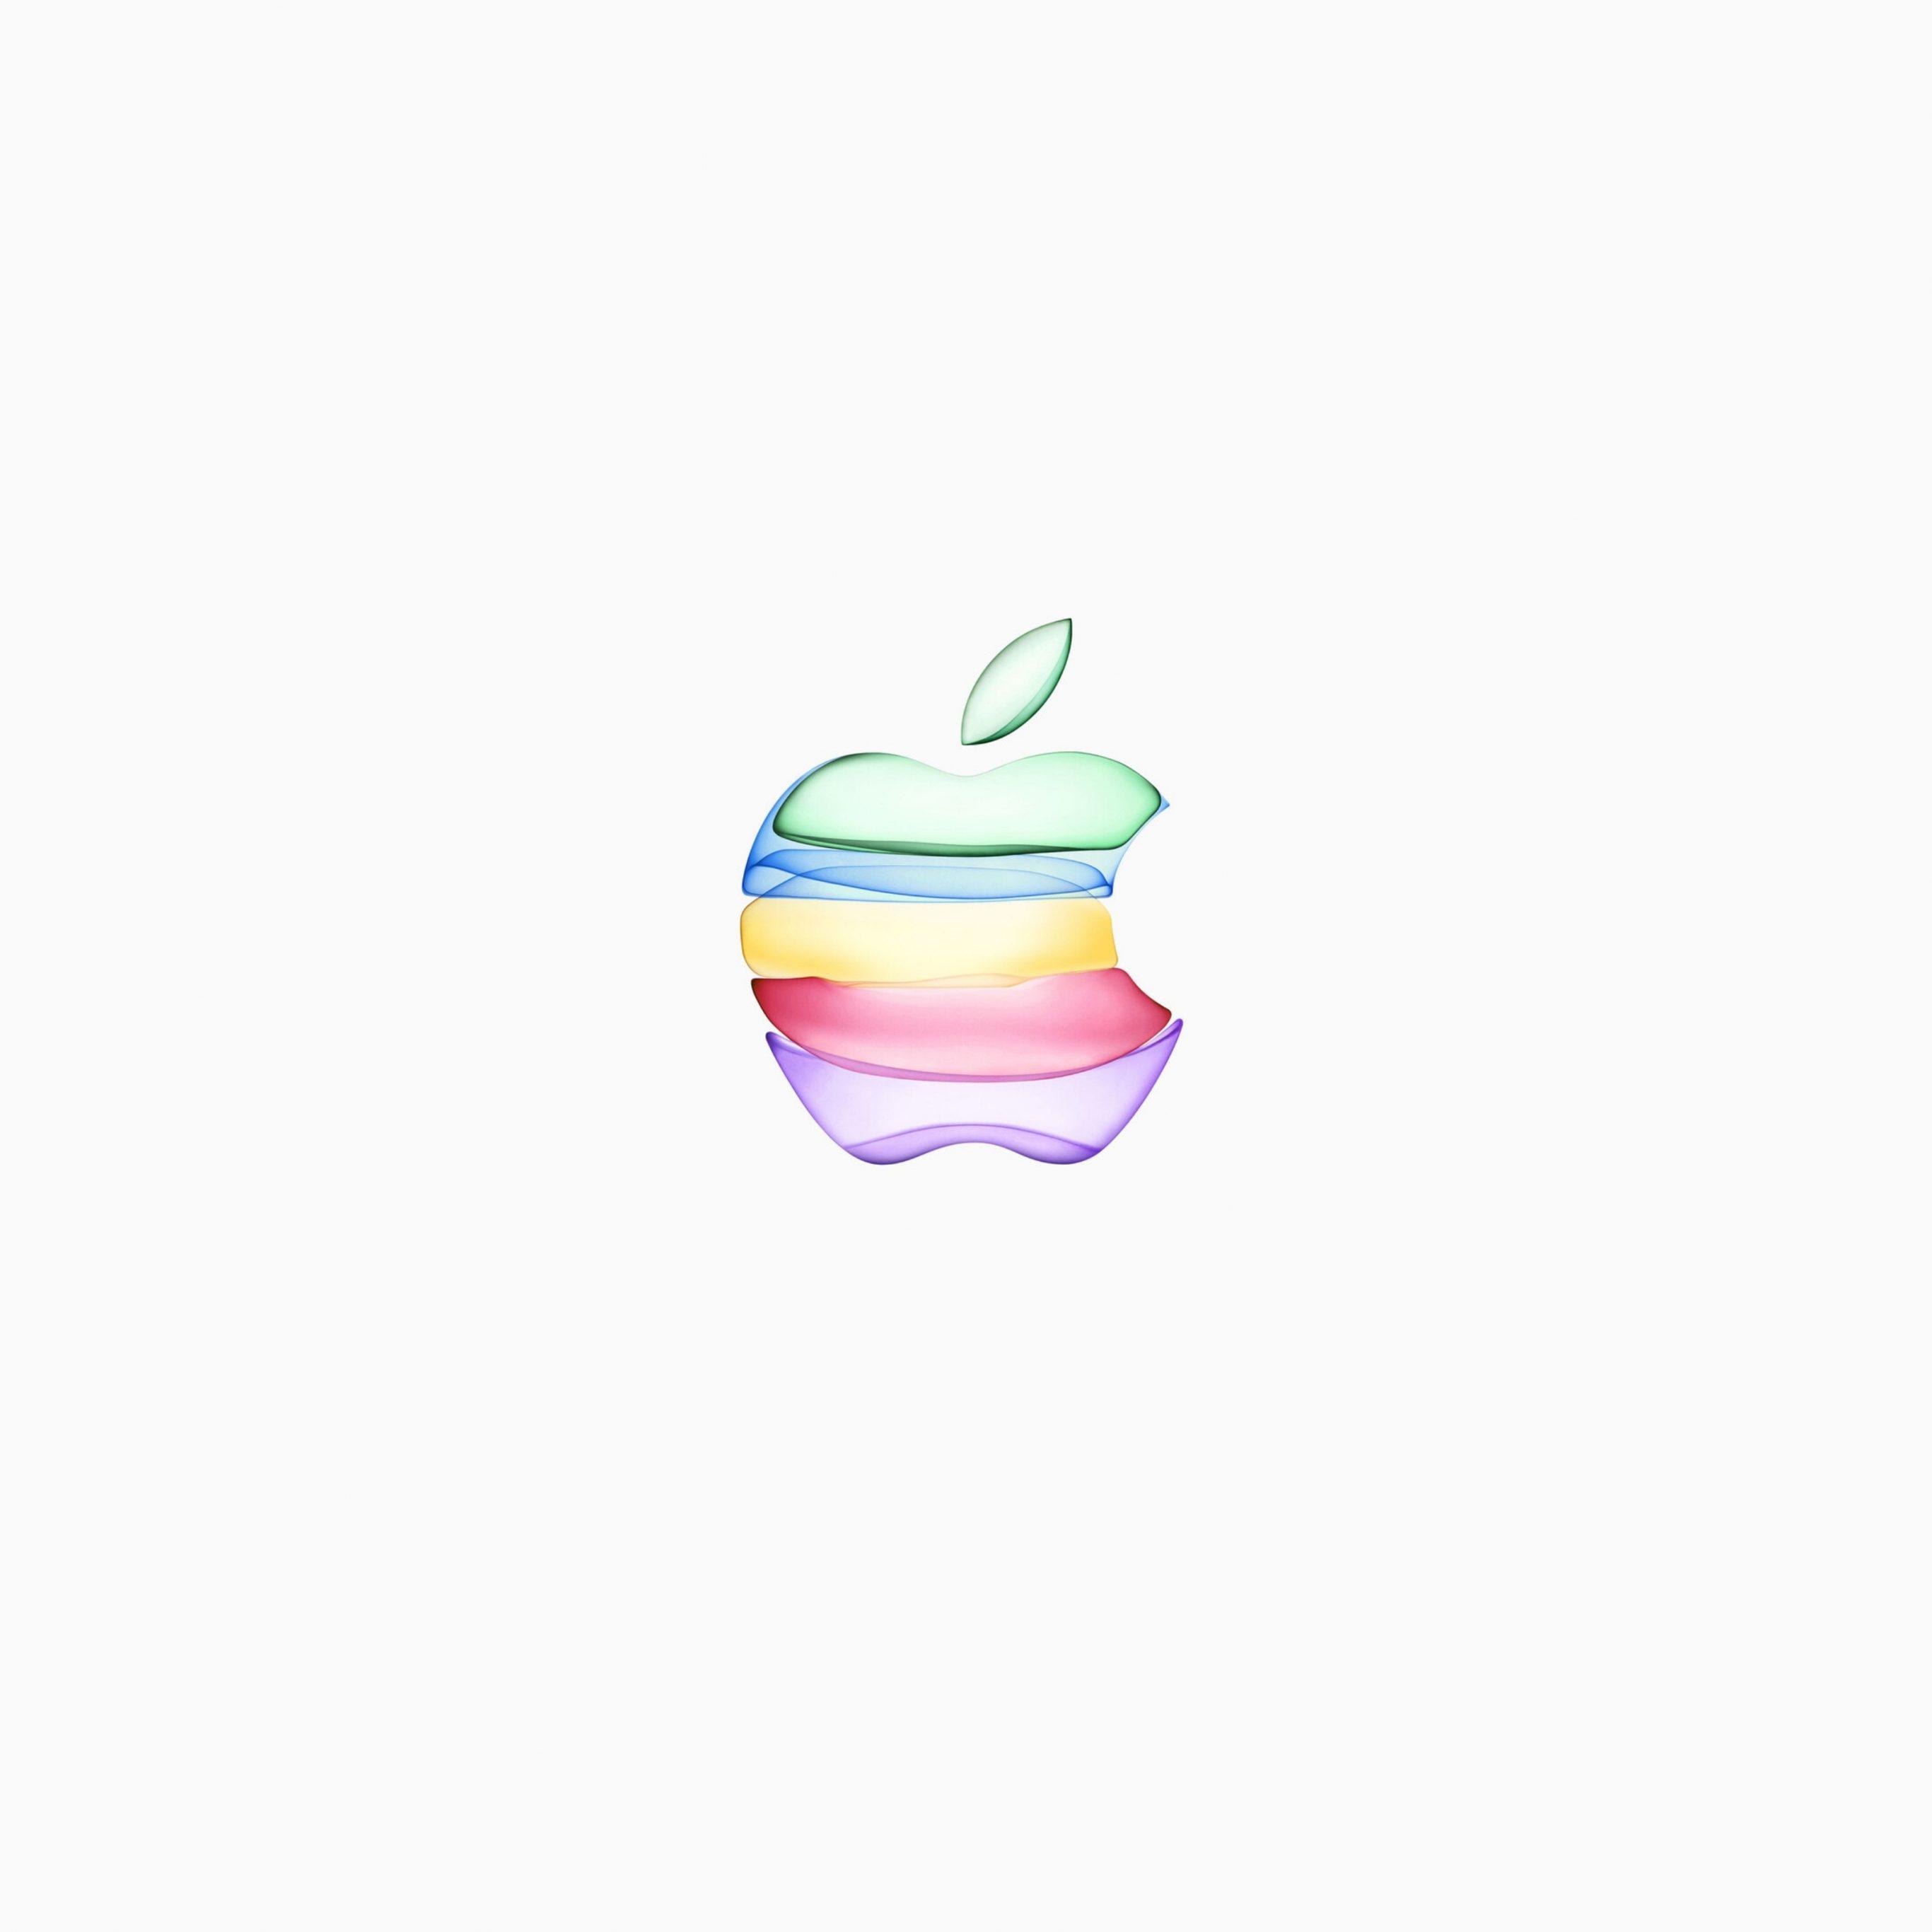 2732x2732 wallpapers 4k iPad Pro iPhone 11 Apple Logo White Background iPad Wallpaper 2732x2732 pixels resolution